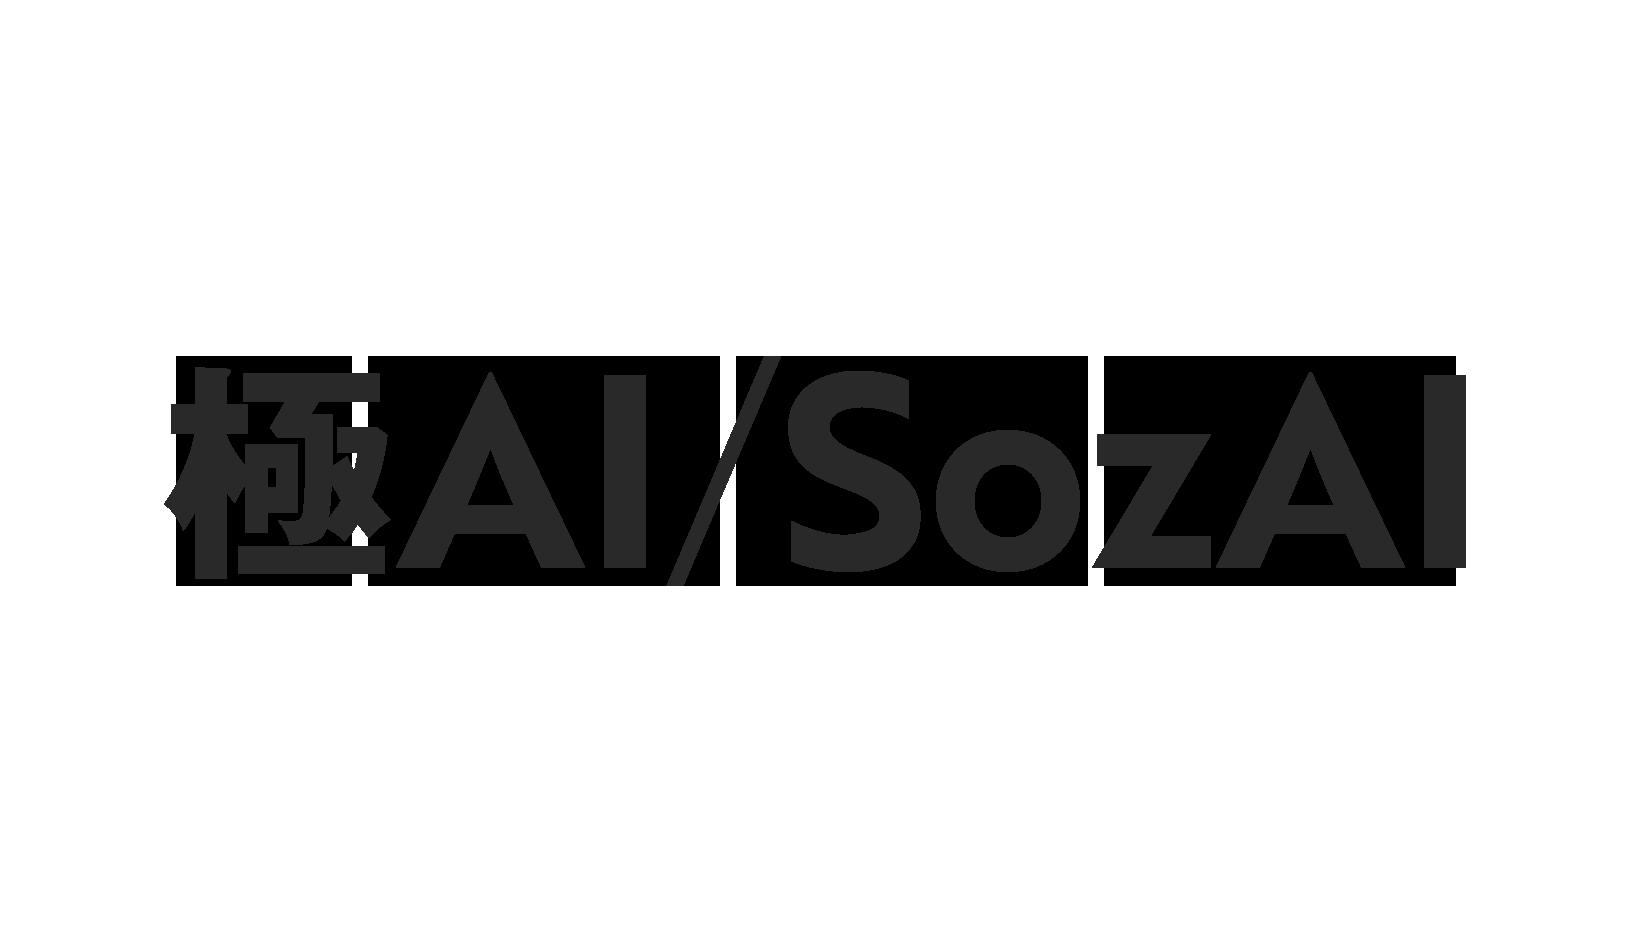 極AI/SozAI